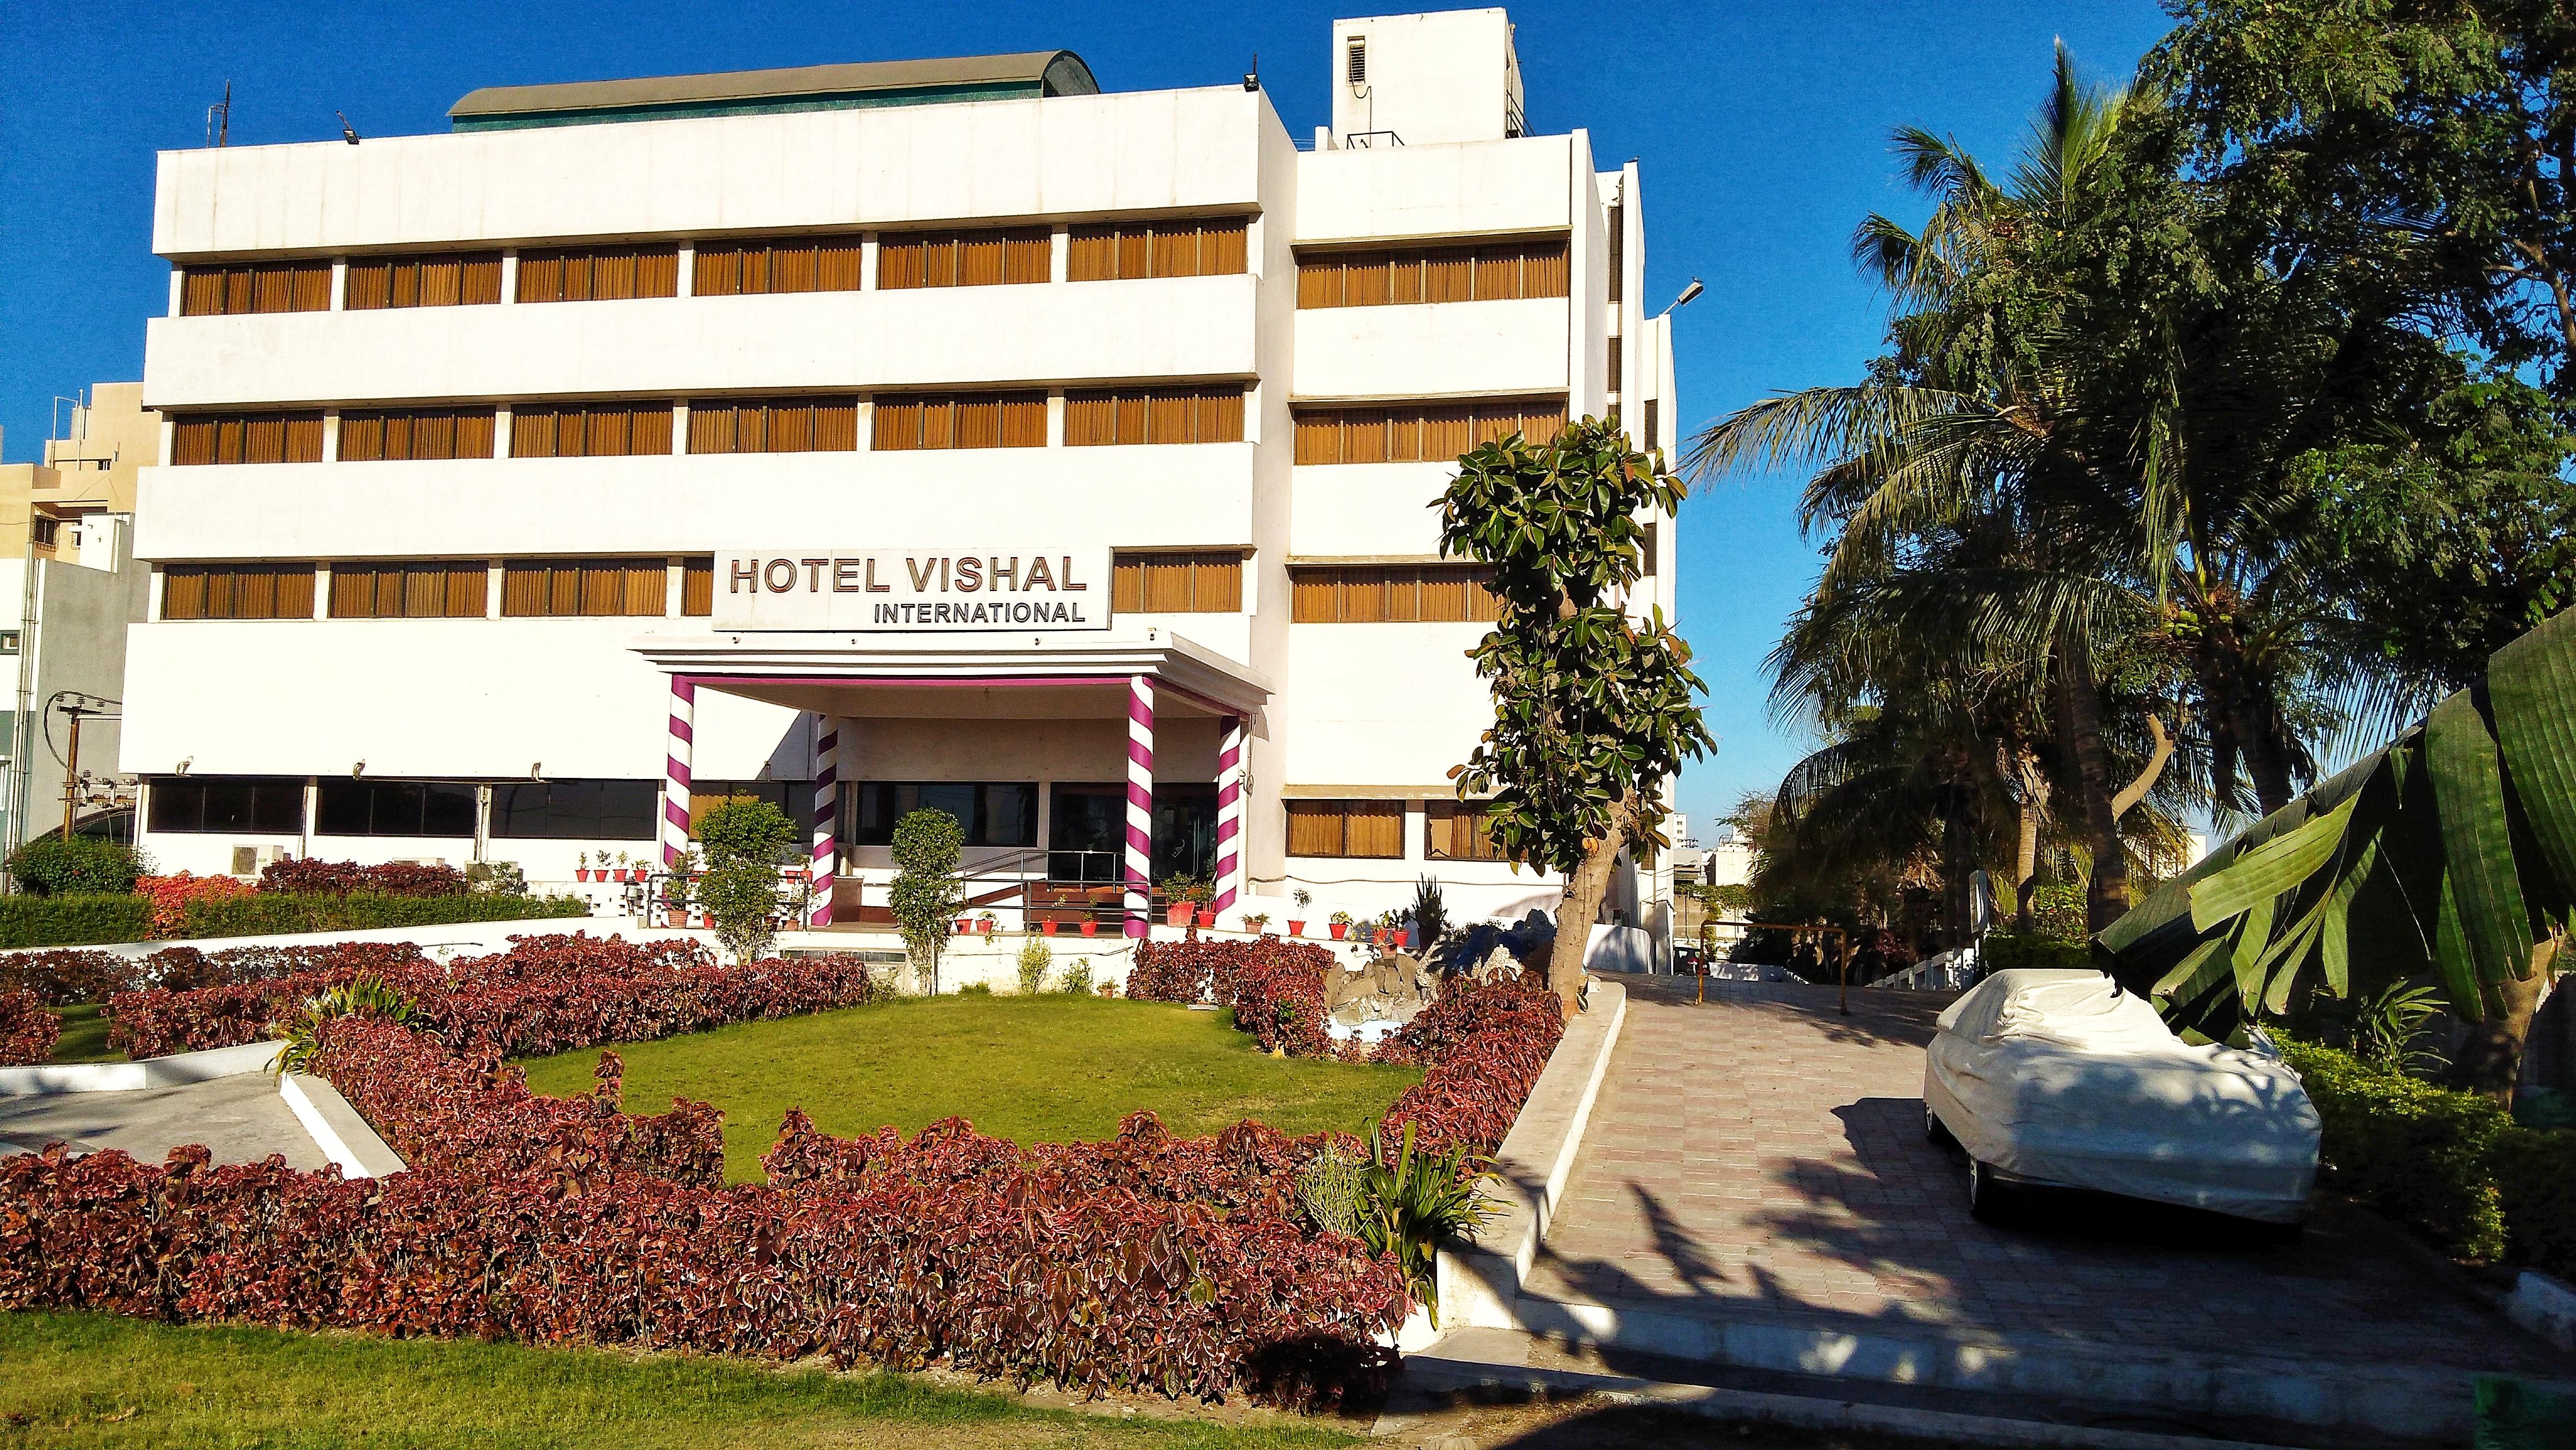 Hotel Vishal International in Jamnagar